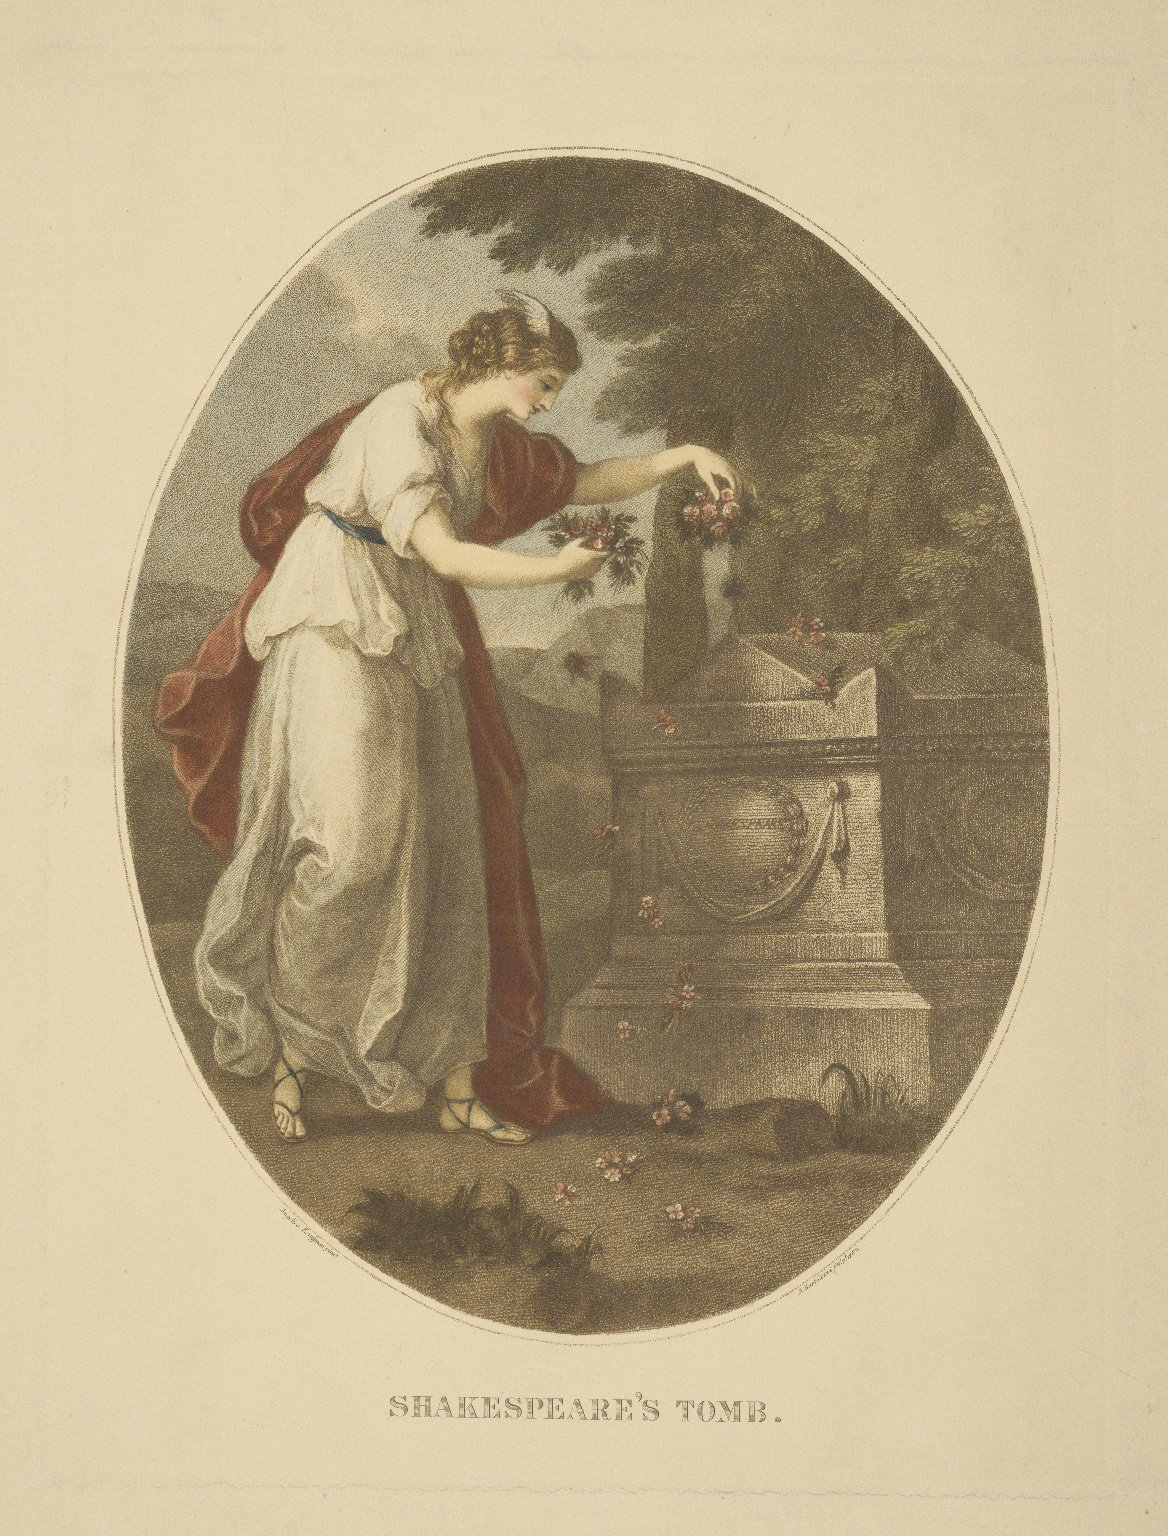 Shakespeare's tomb [graphic] / Angelica Kauffman pinxt. ; F. Bartolozzi sculp. 1782.